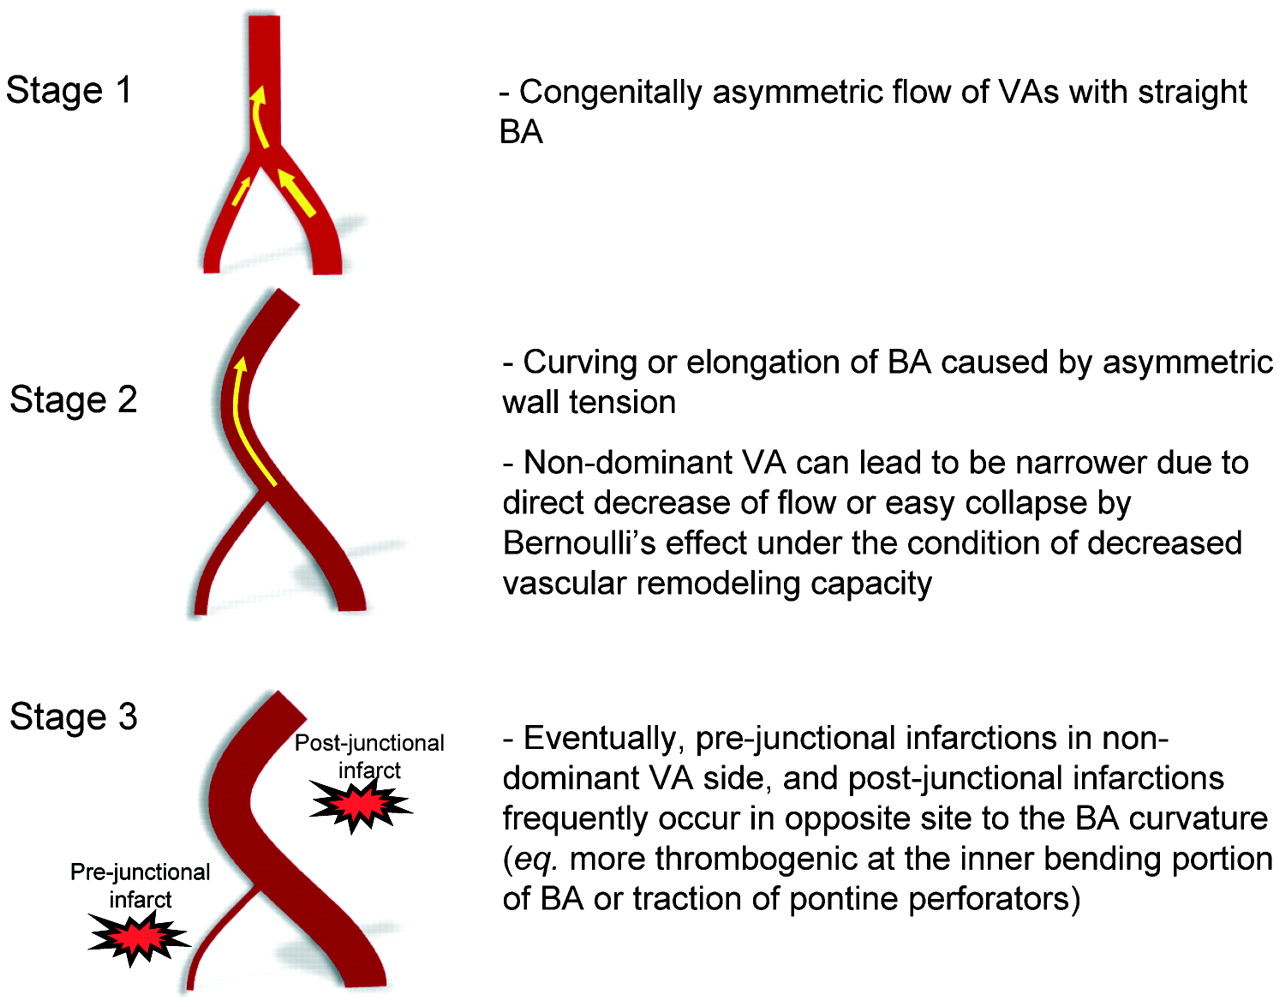 Vertebral Artery Dominance Contributes To Basilar Artery Curvature